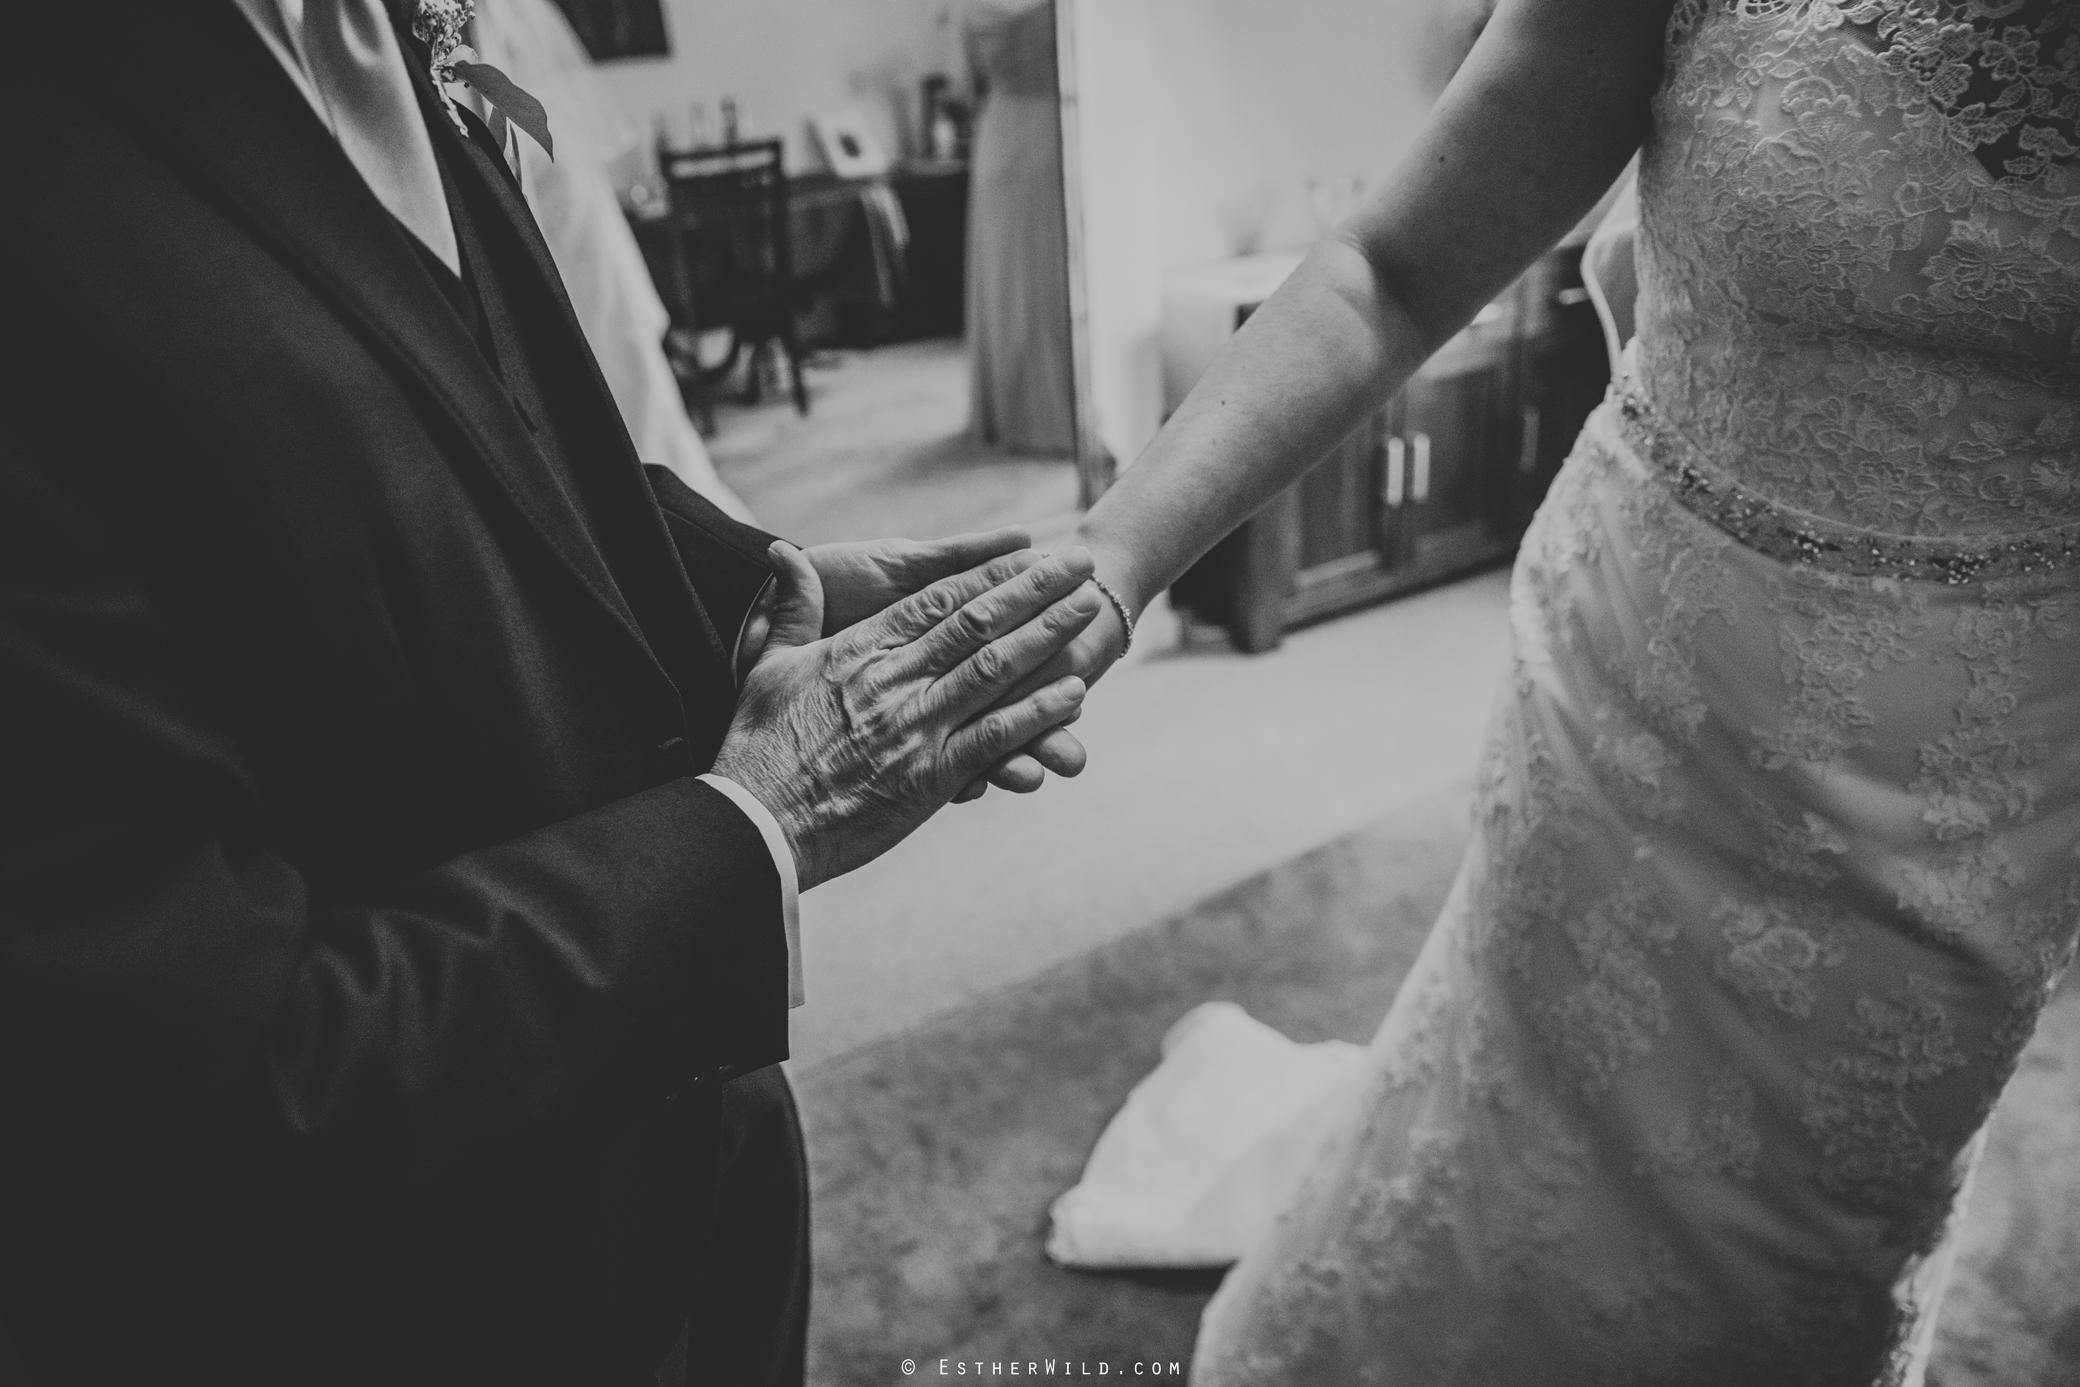 Wedding_Kings_Lynn_Town_Hall_Norfolk_Photographer_Esther_Wild_IMG_0638-2.jpg